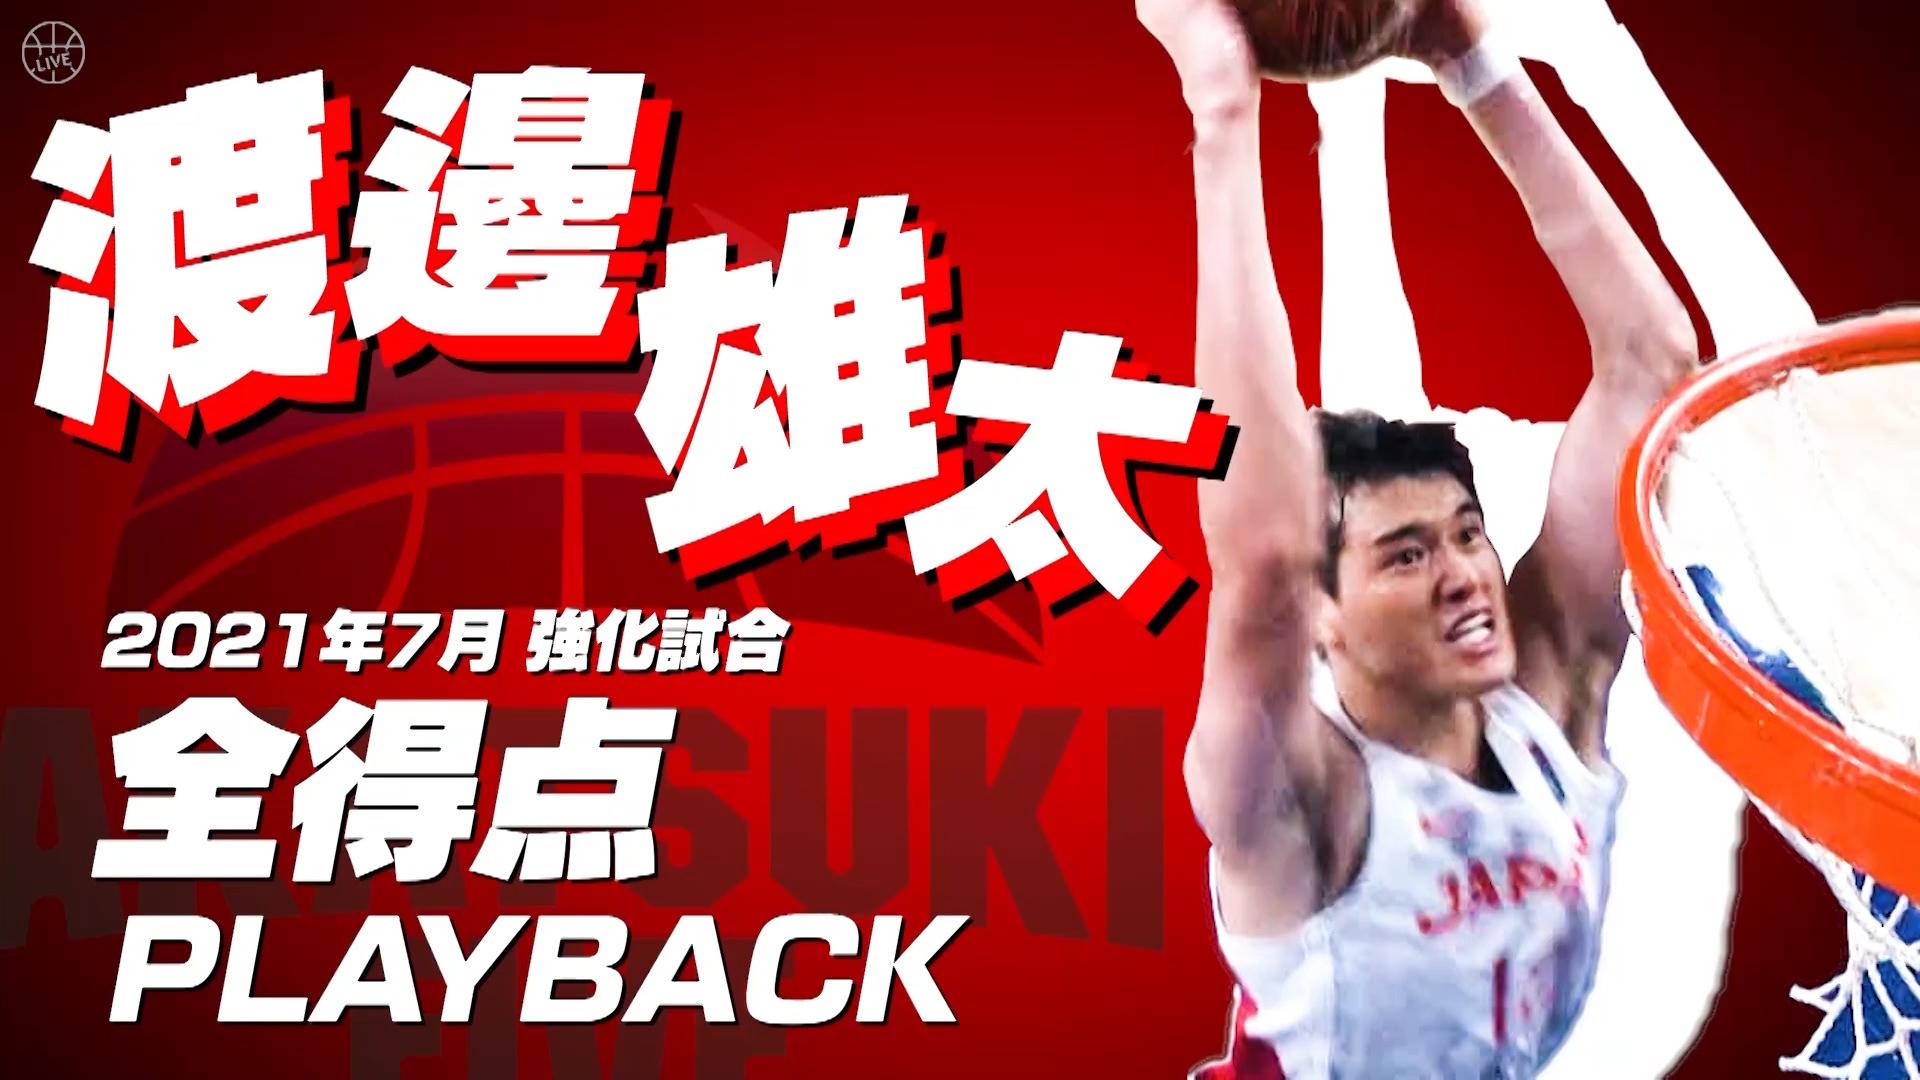 【TOP PERFORMANCE】渡邊雄太 日本代表強化試合 全得点